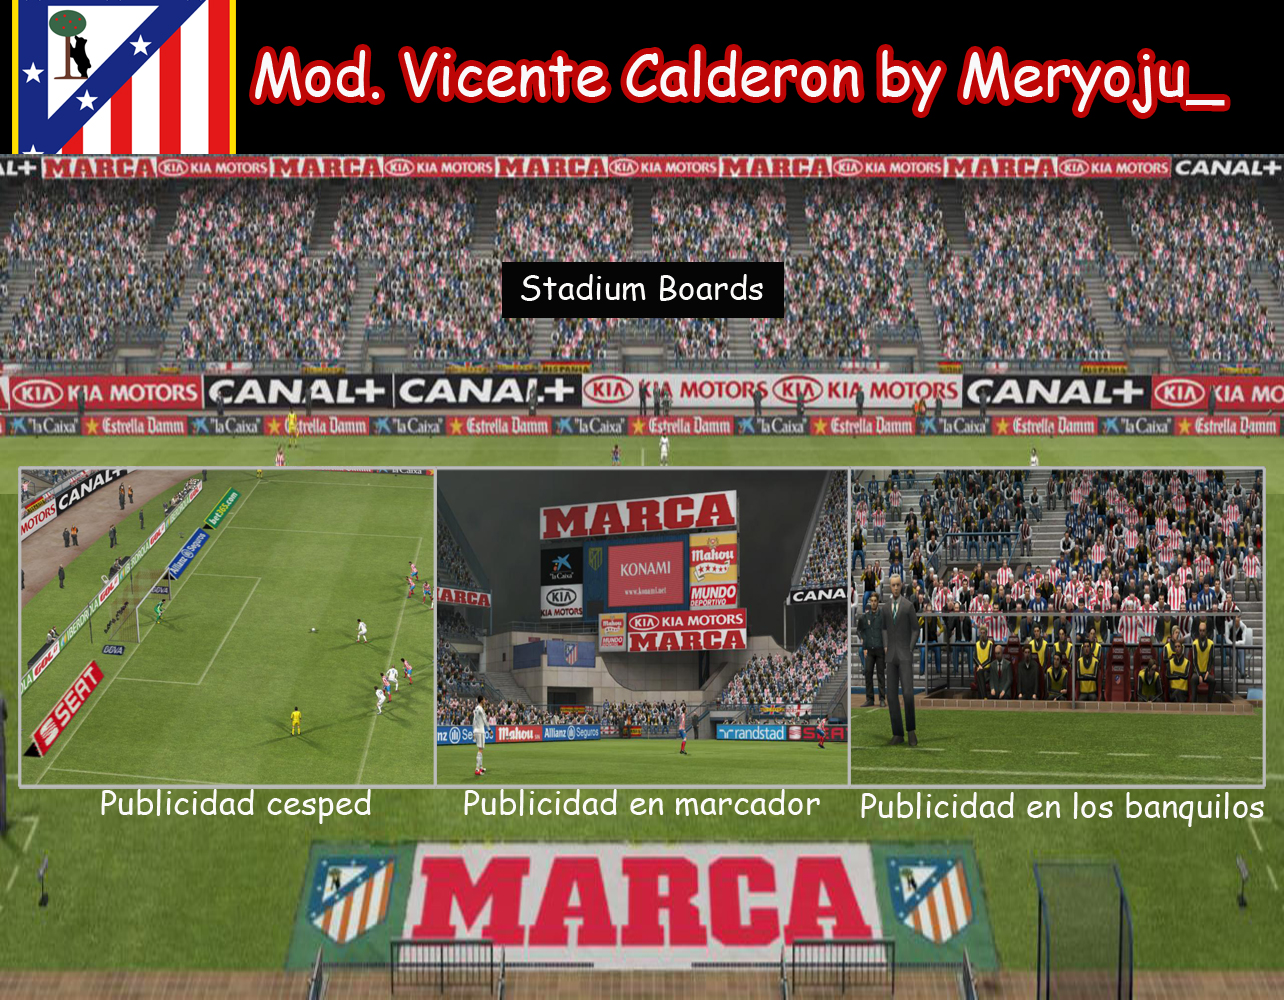 Mod. Vicente Calderon by Meryoju_